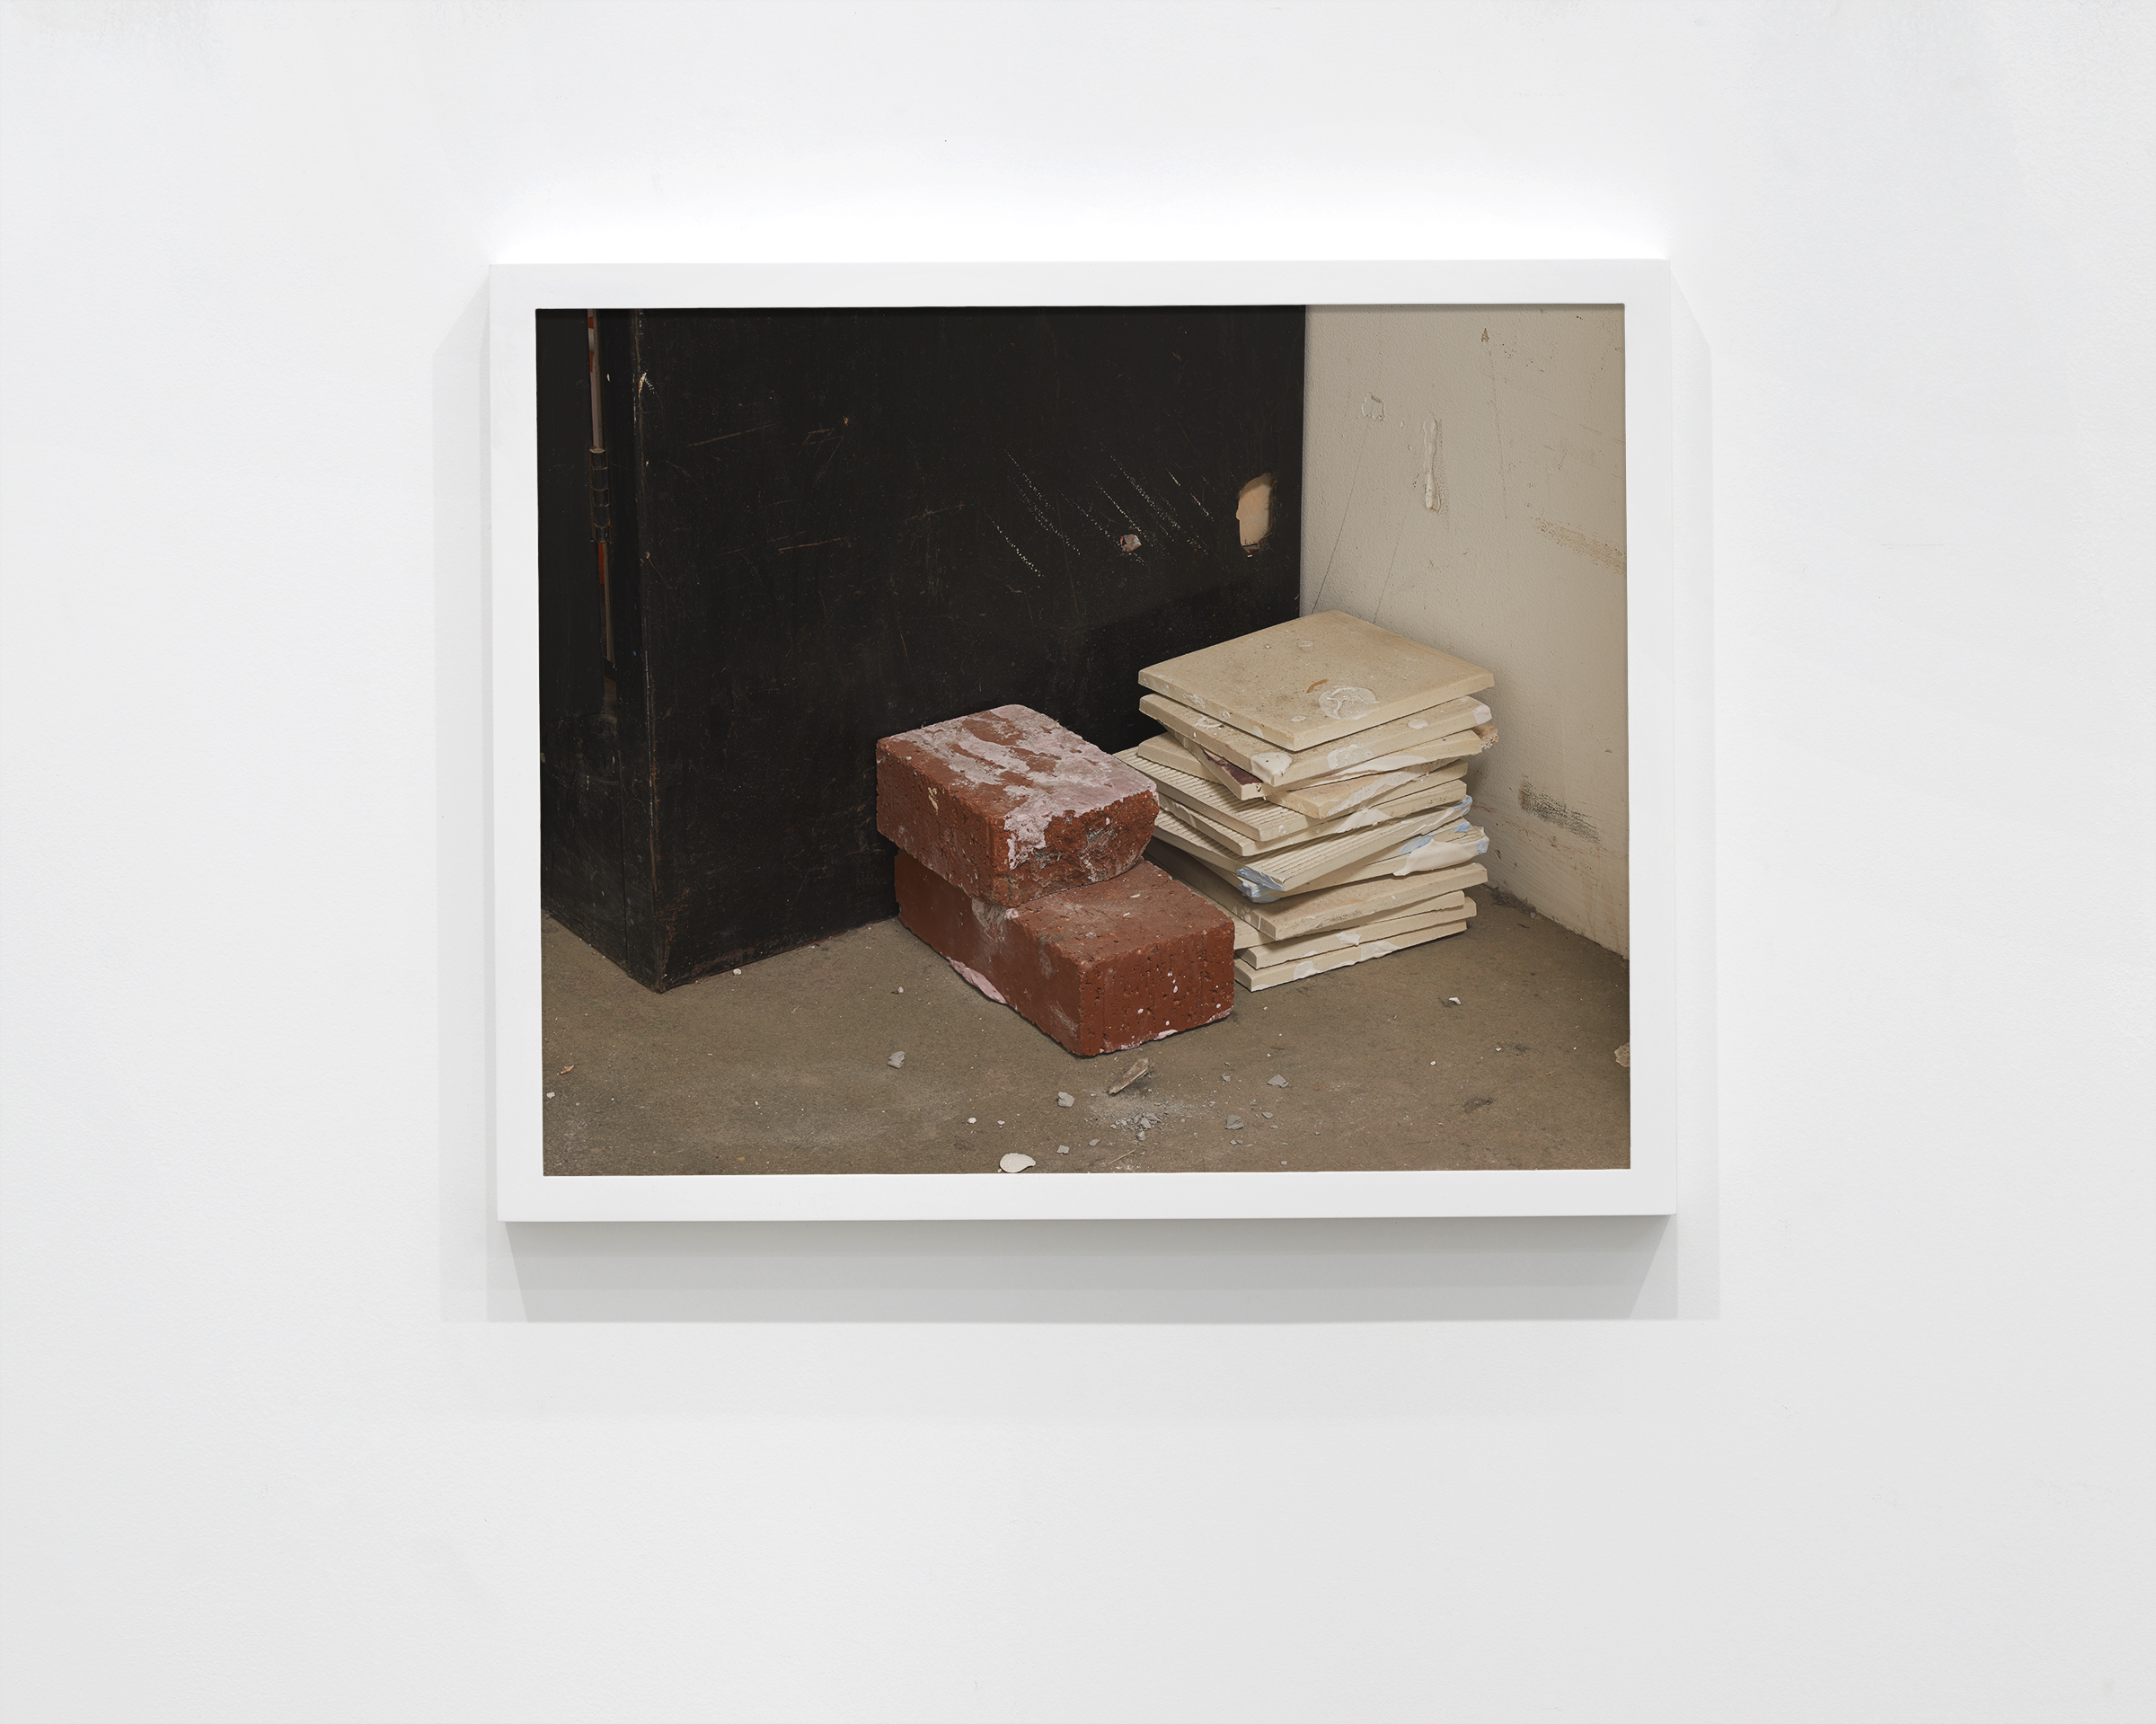 """Warner Study #52"", 2017 - 2018  16 x 20 in. (40.64 x 50.80 cm)"